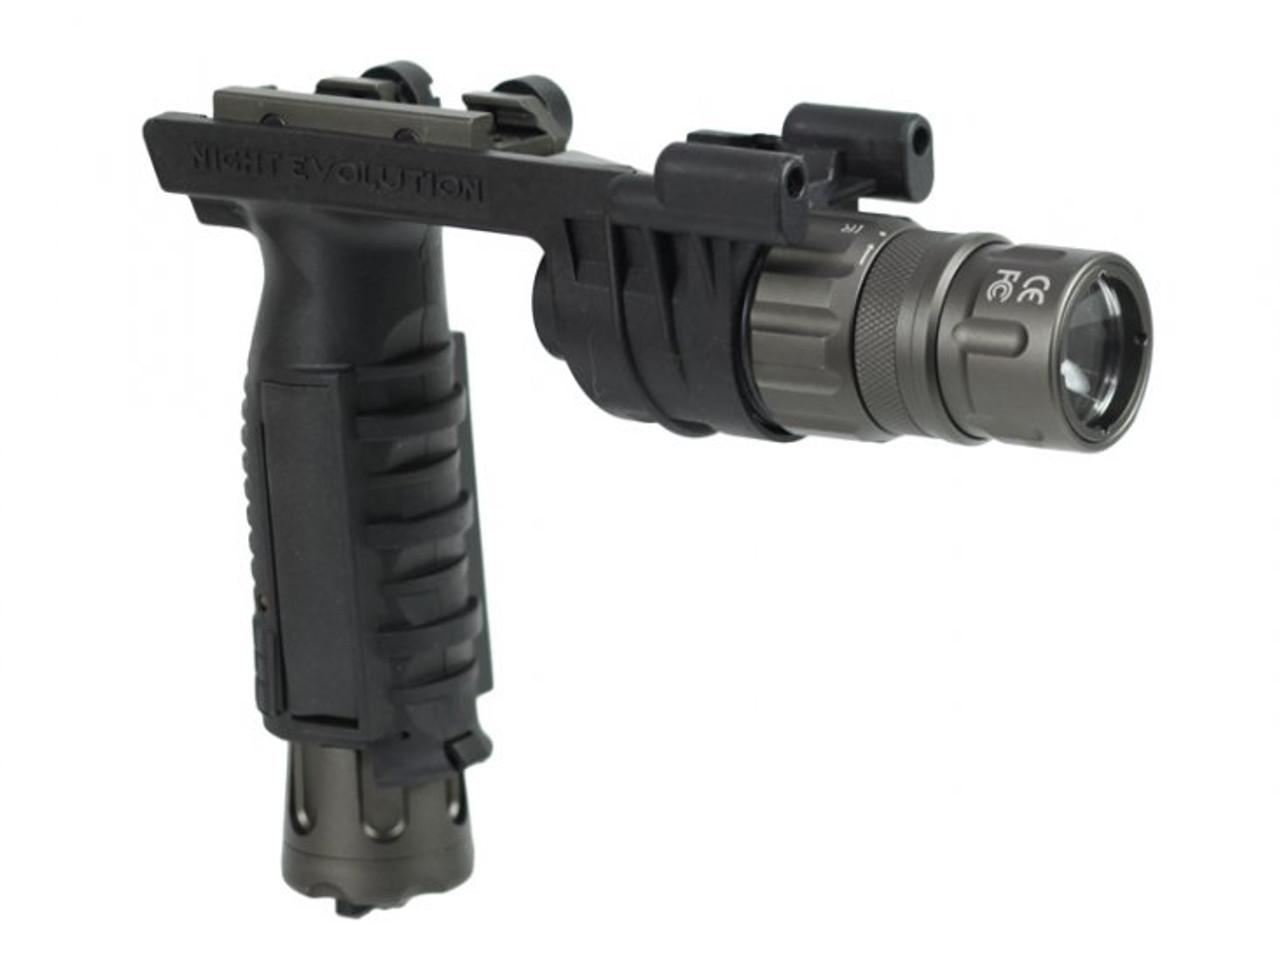 Bravo Tactical Airsoft V2 LED Weapon Flashlight Foregrip 220 Lumens Dark Earth